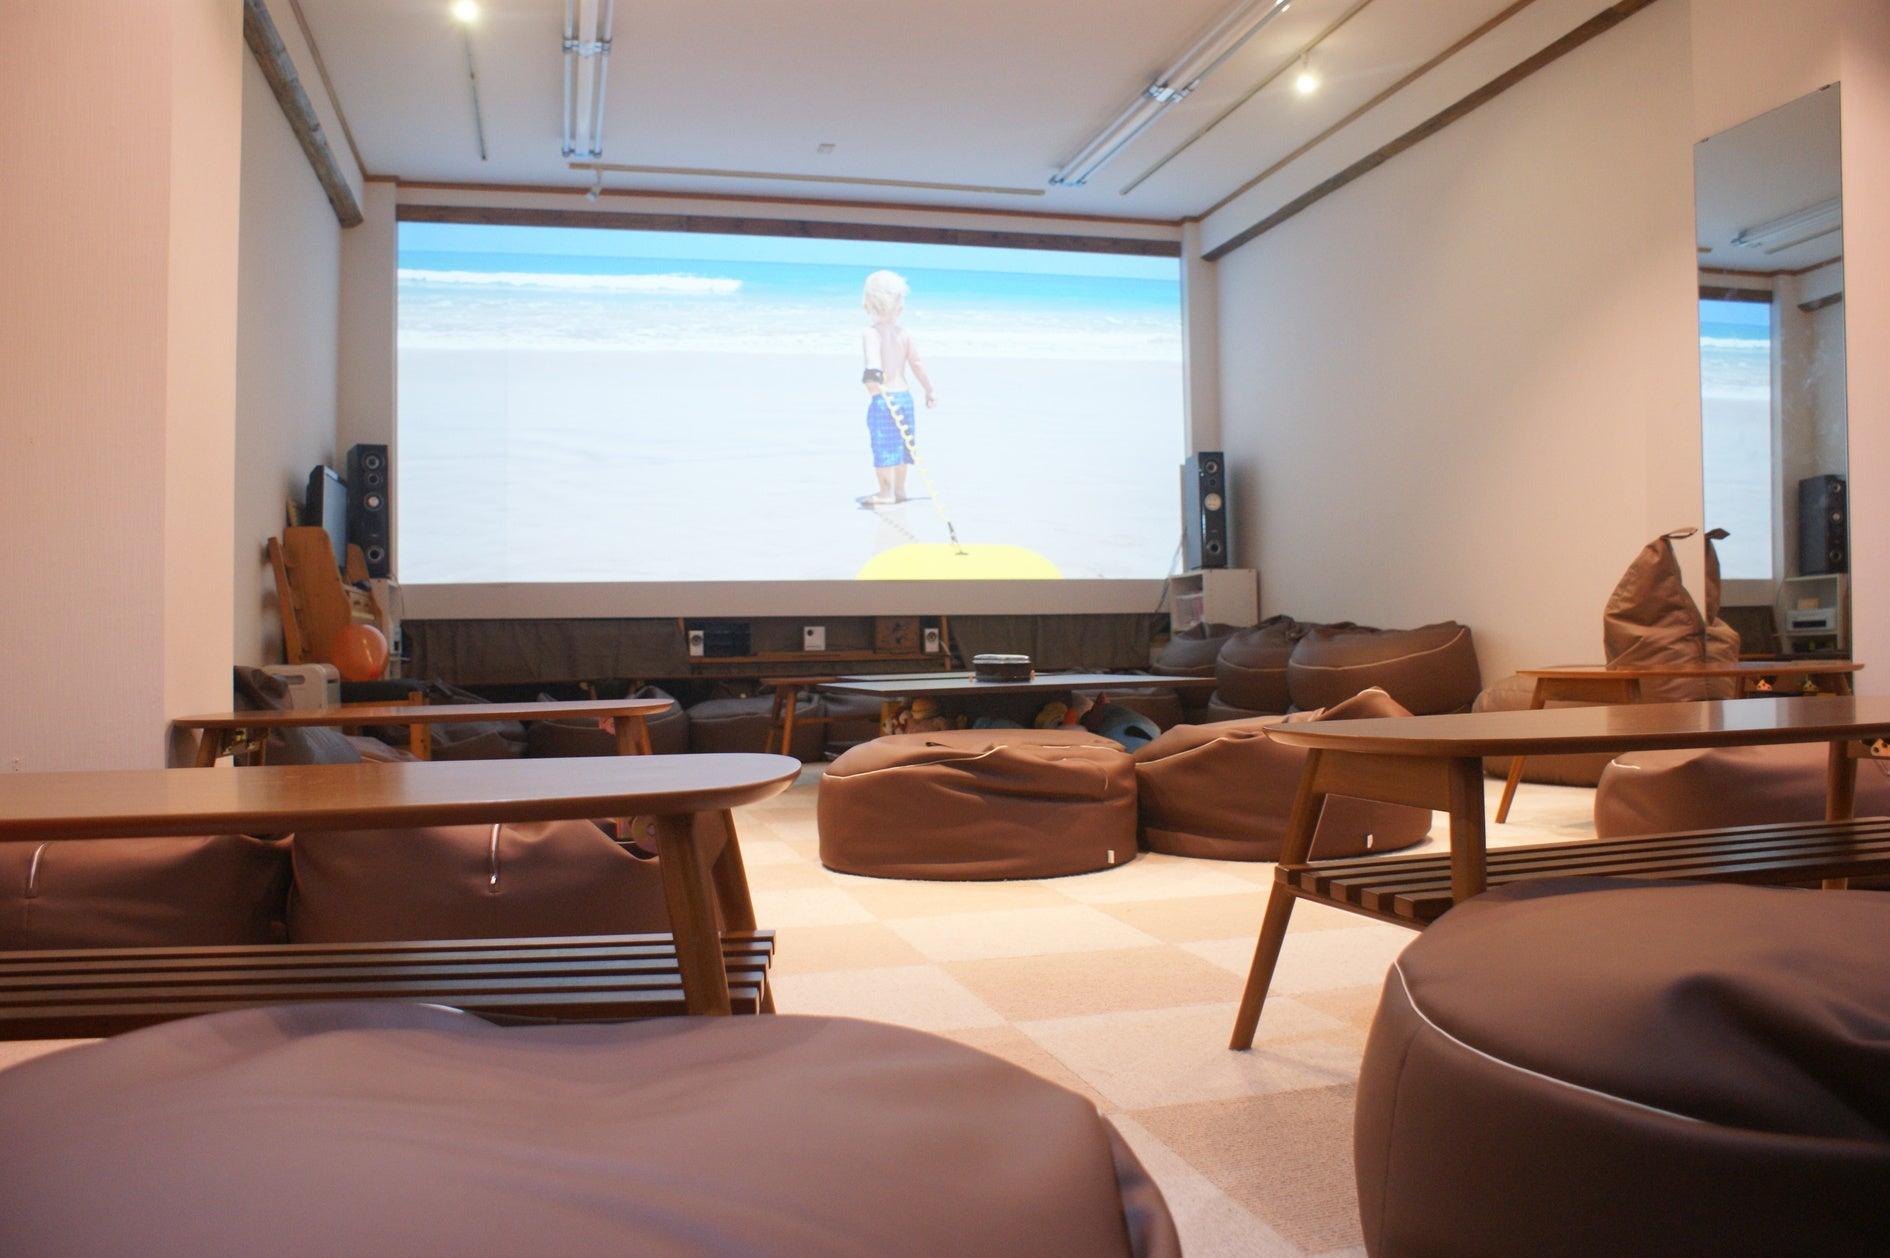 Cafe & Bar 併設、200インチ大画面シアター!映画鑑賞や上映会に最適! の写真